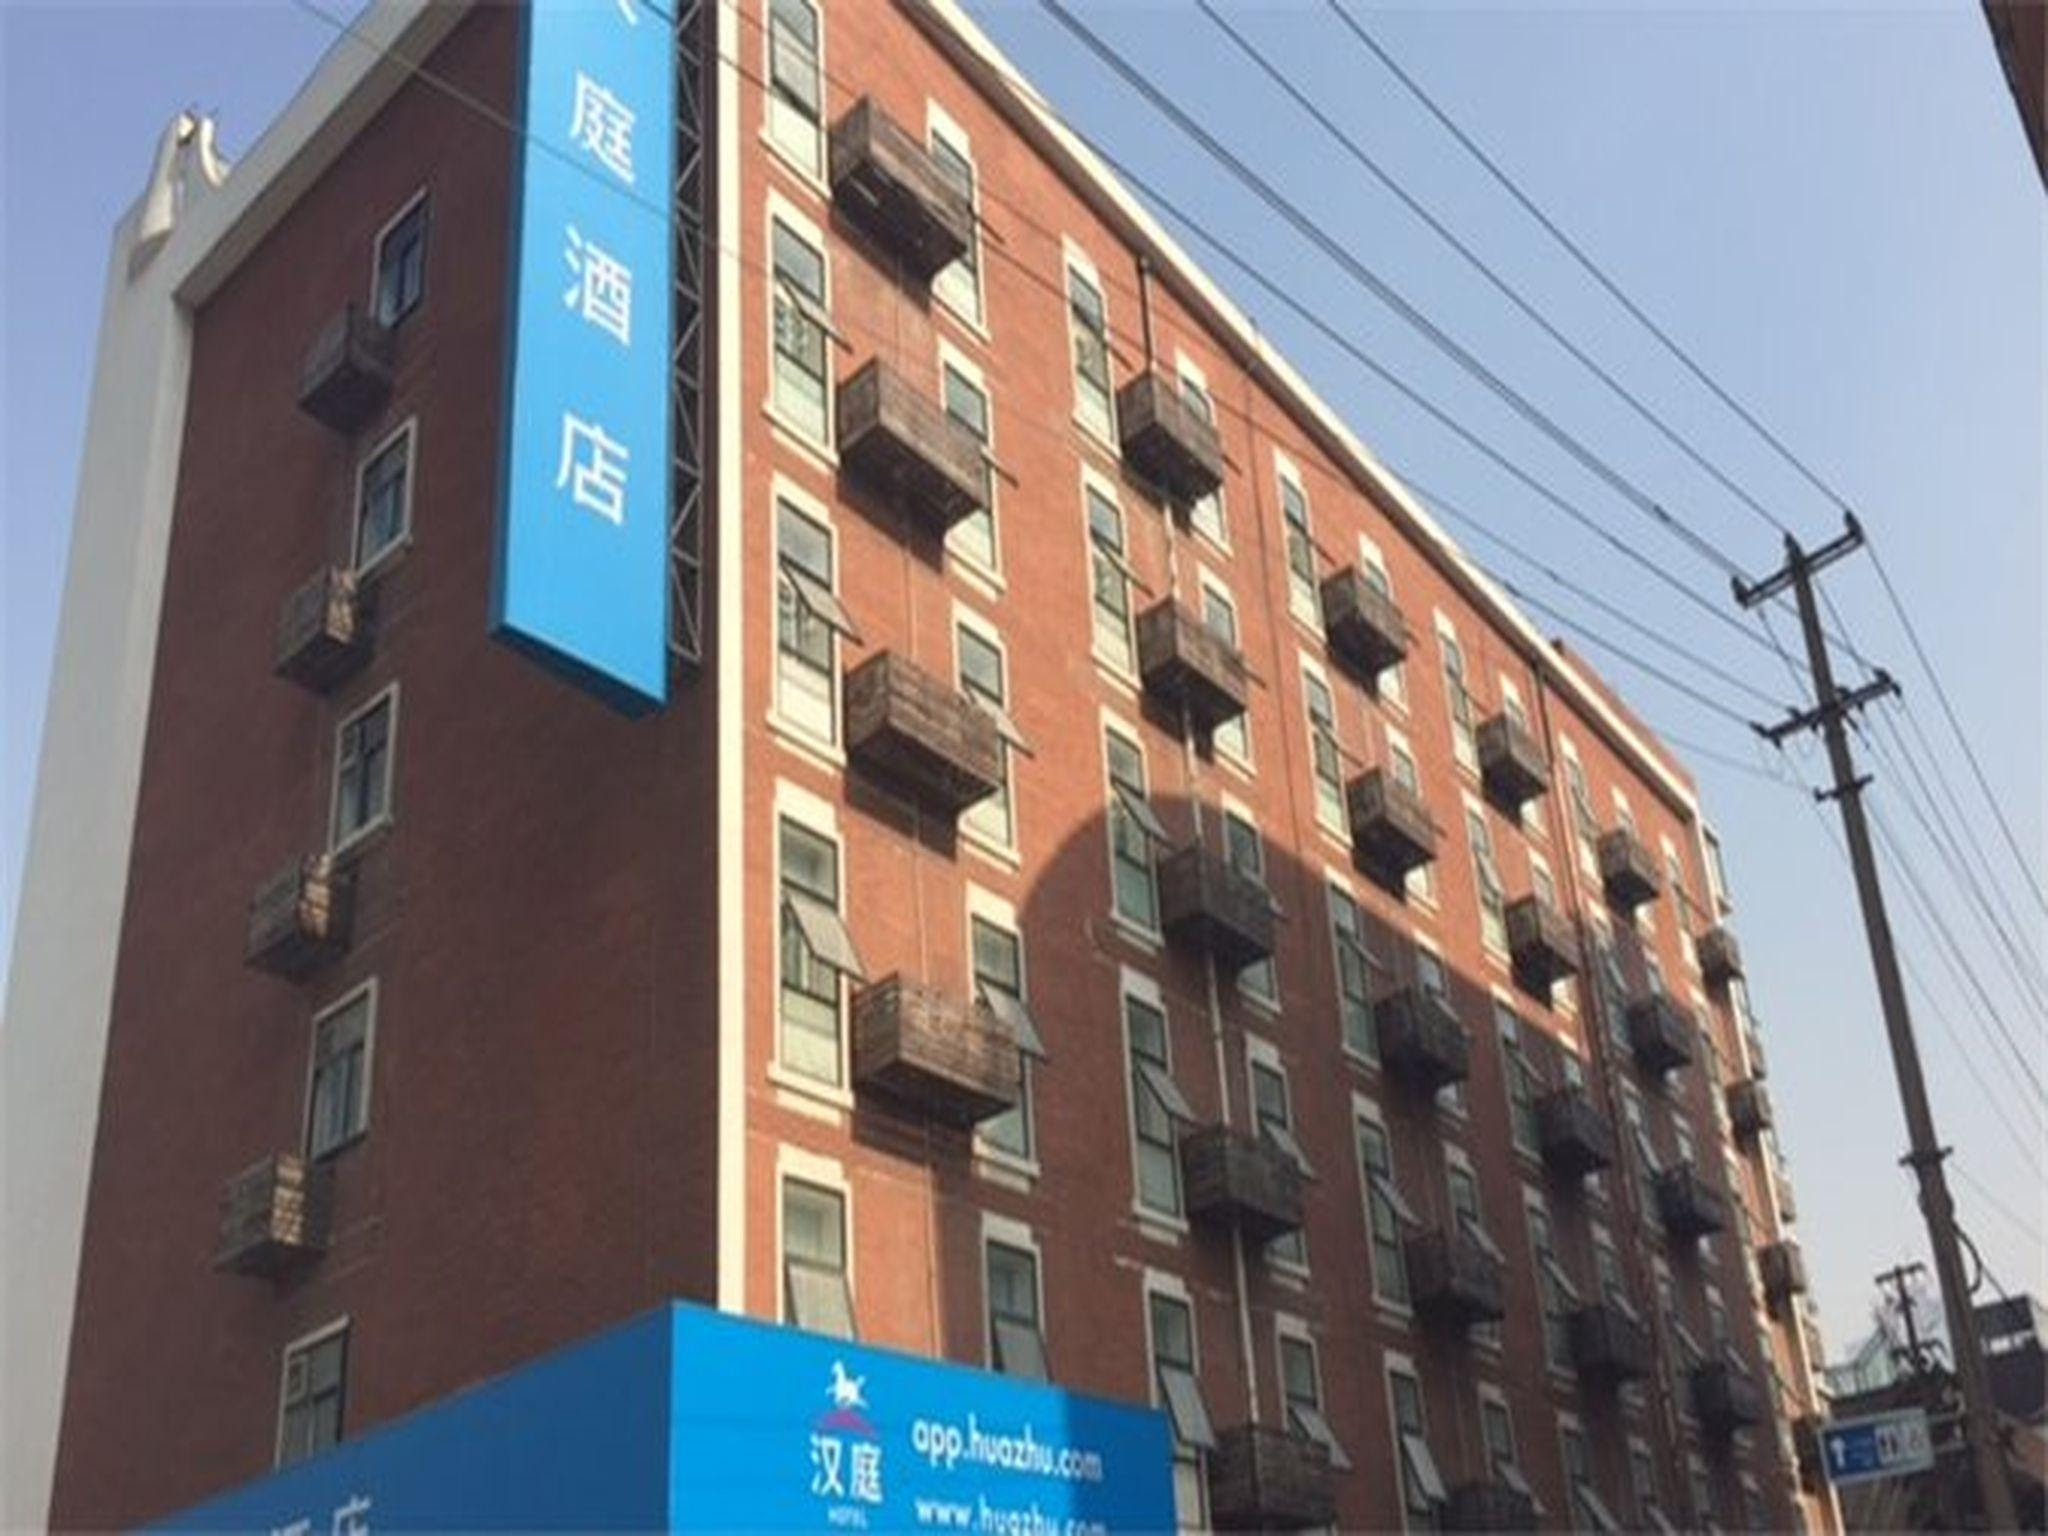 New - Hanting Hotel Shanghai Bund Branch Reviews